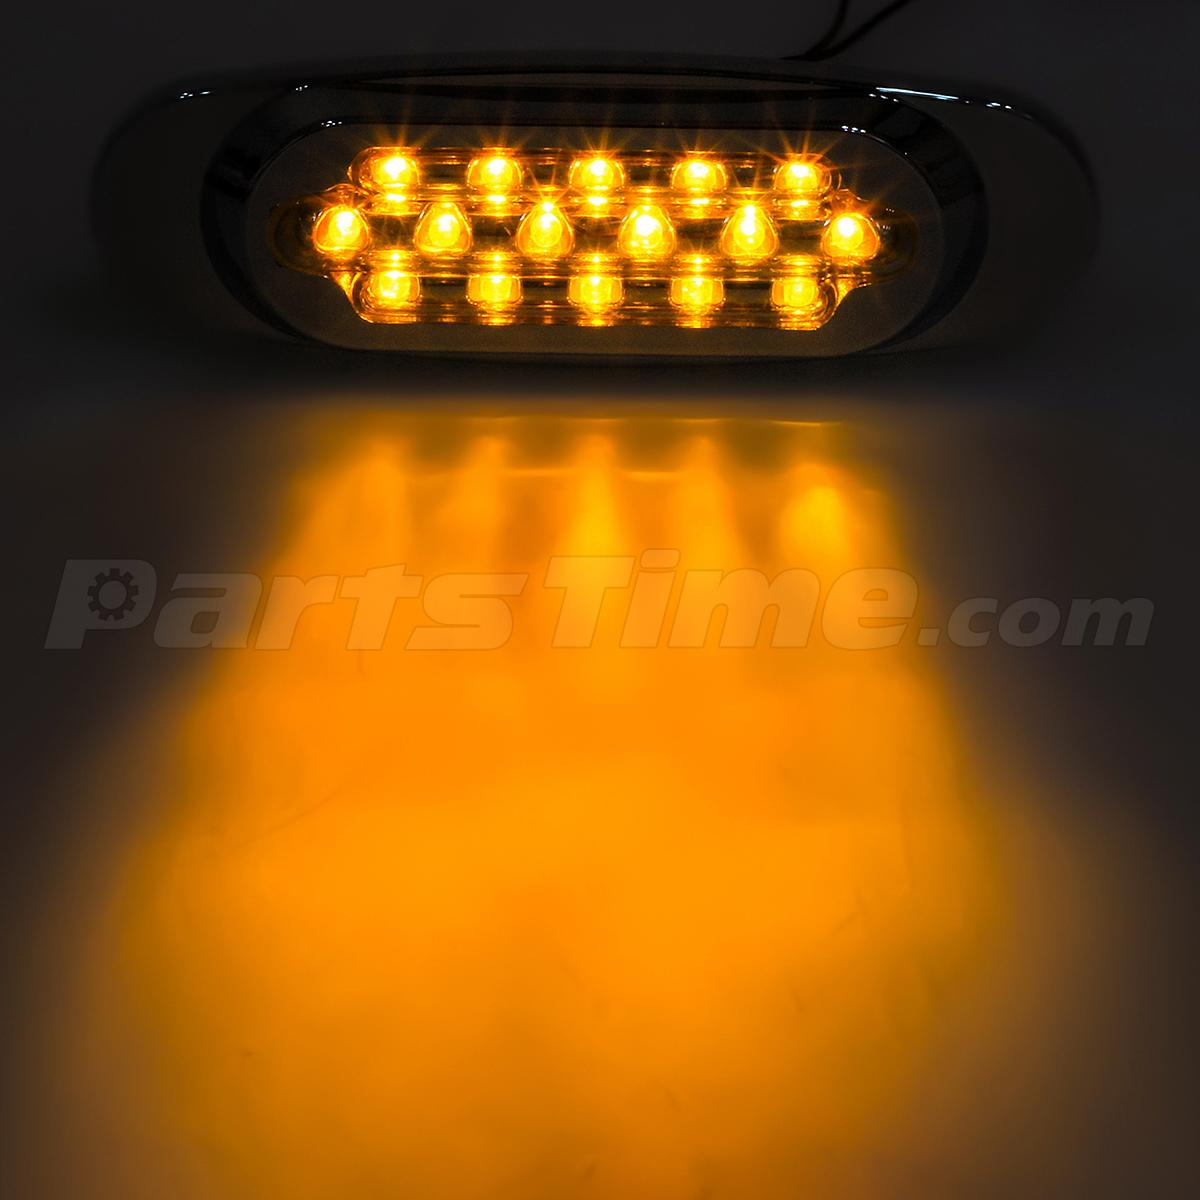 small resolution of  fuse panel questions 165160 11 p a2v5bglmzq 2009 kenworth w900 headlight